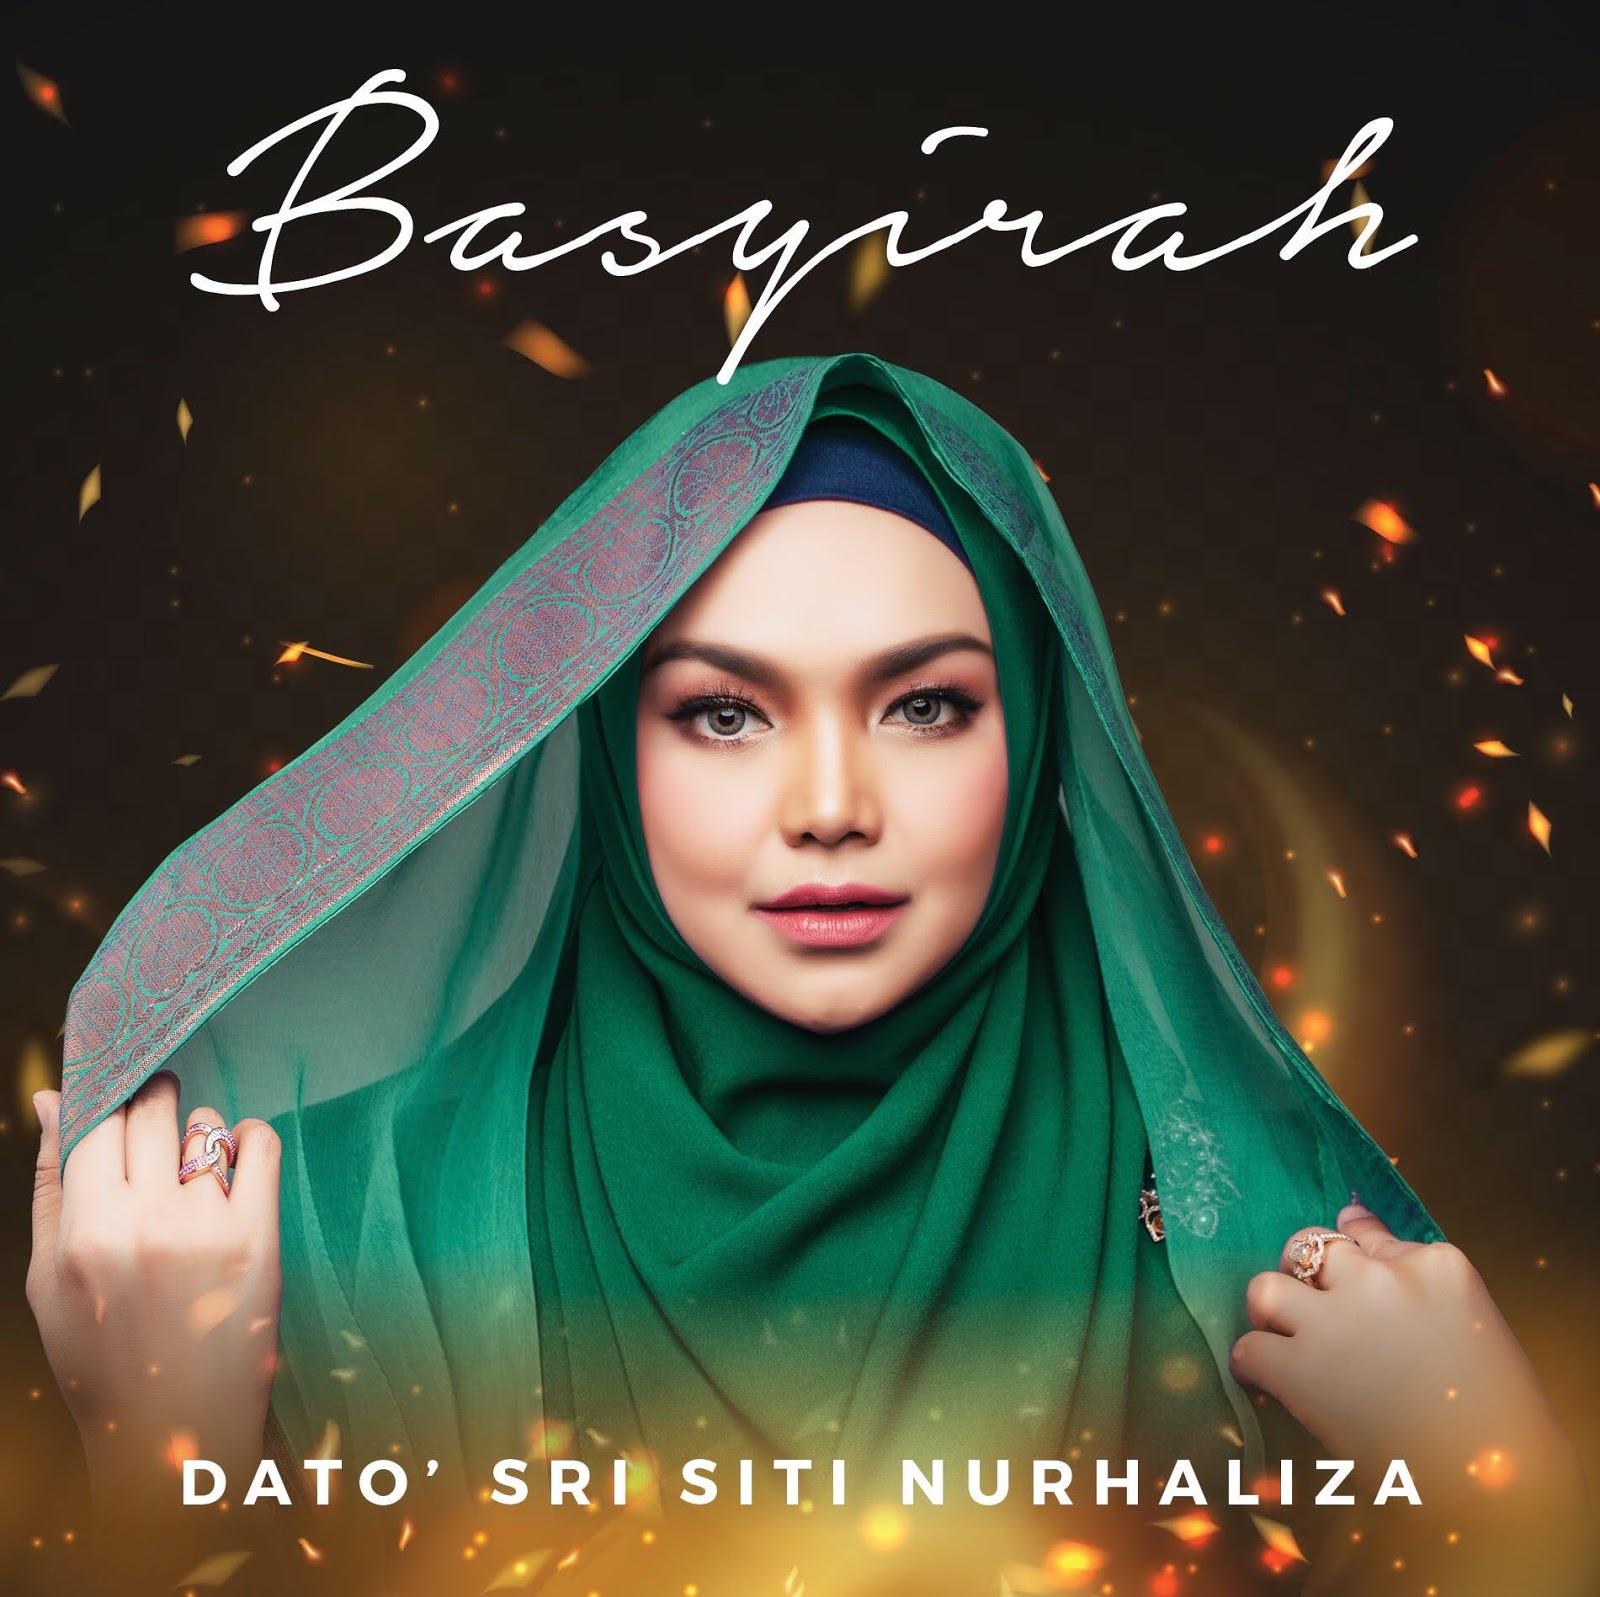 Lirik Lagu Dato' Sri Siti Nurhaliza - Basyirah